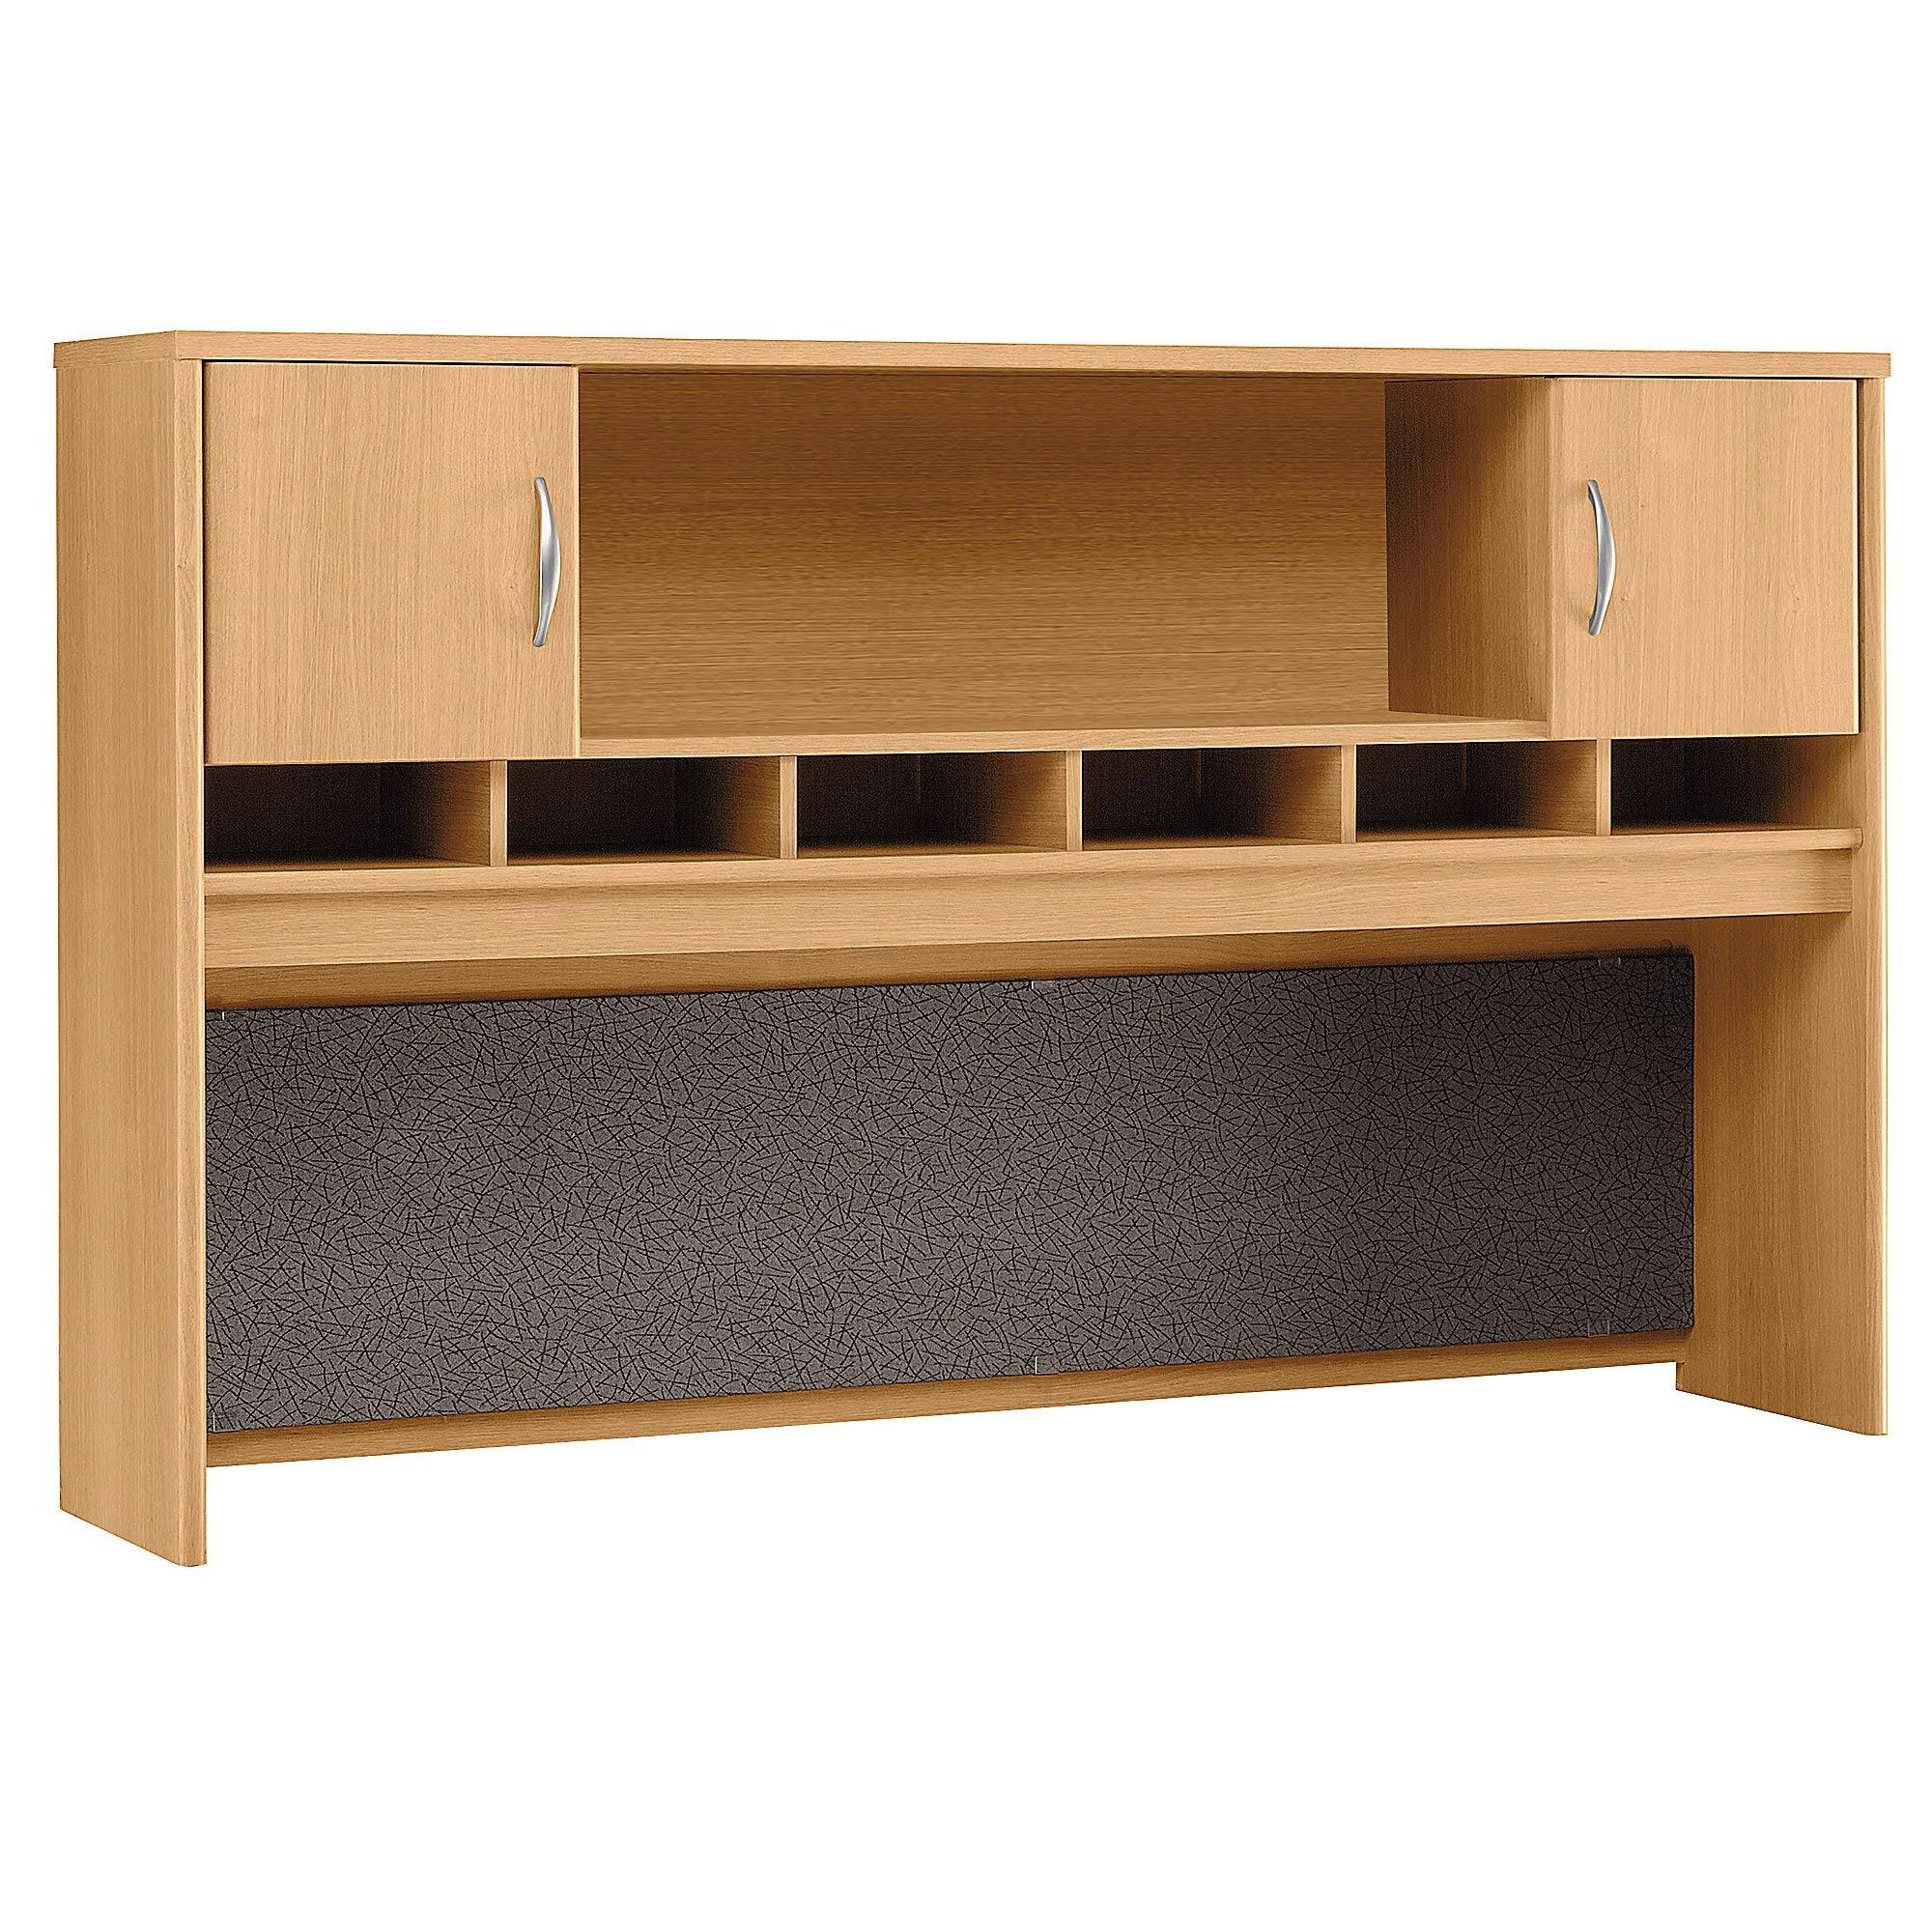 Bush Business Furniture Series C 72W 2 Door Hutch - Light Oak 71W X 15D X 43H Ergonomichome American Made TAA Compliant